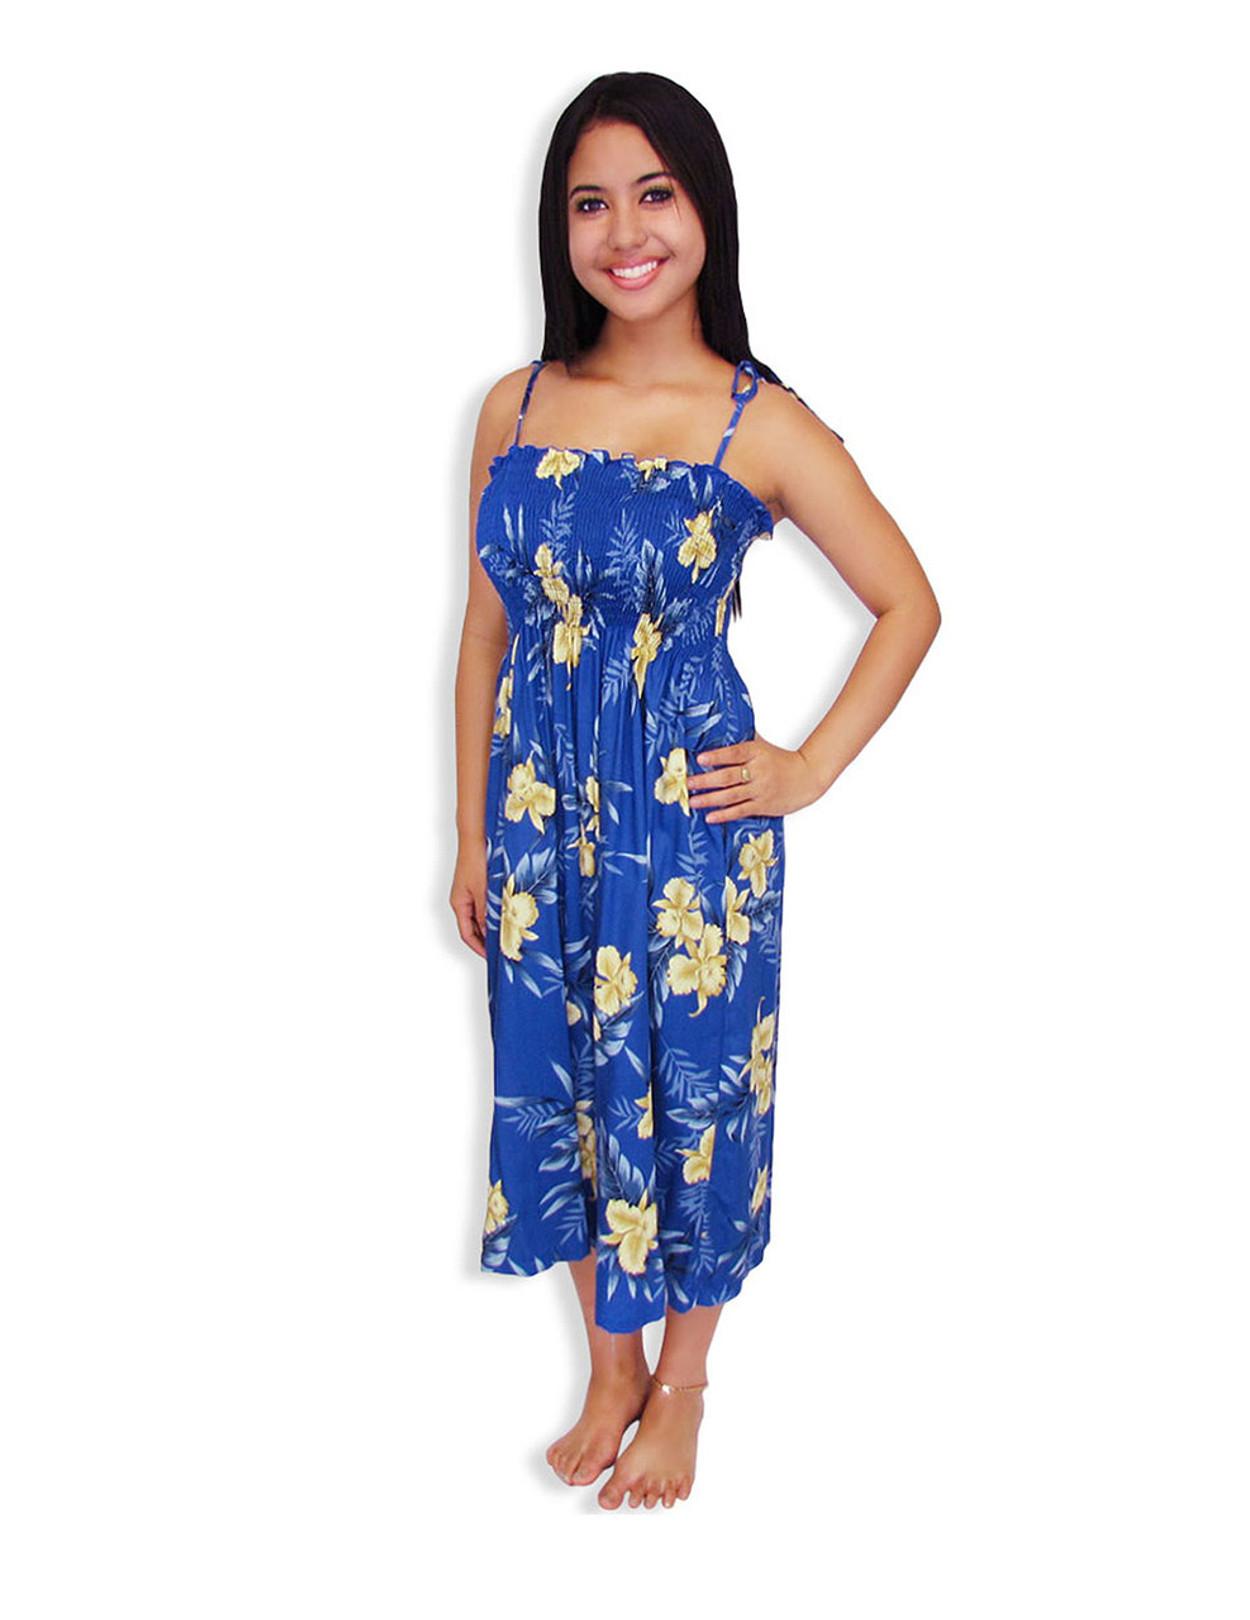 f1bcaf4749 Okalani Smock Rayon Hawaiian Dress 100% Rayon Fabric Smocked Tube Top  Design Tie On Shoulder